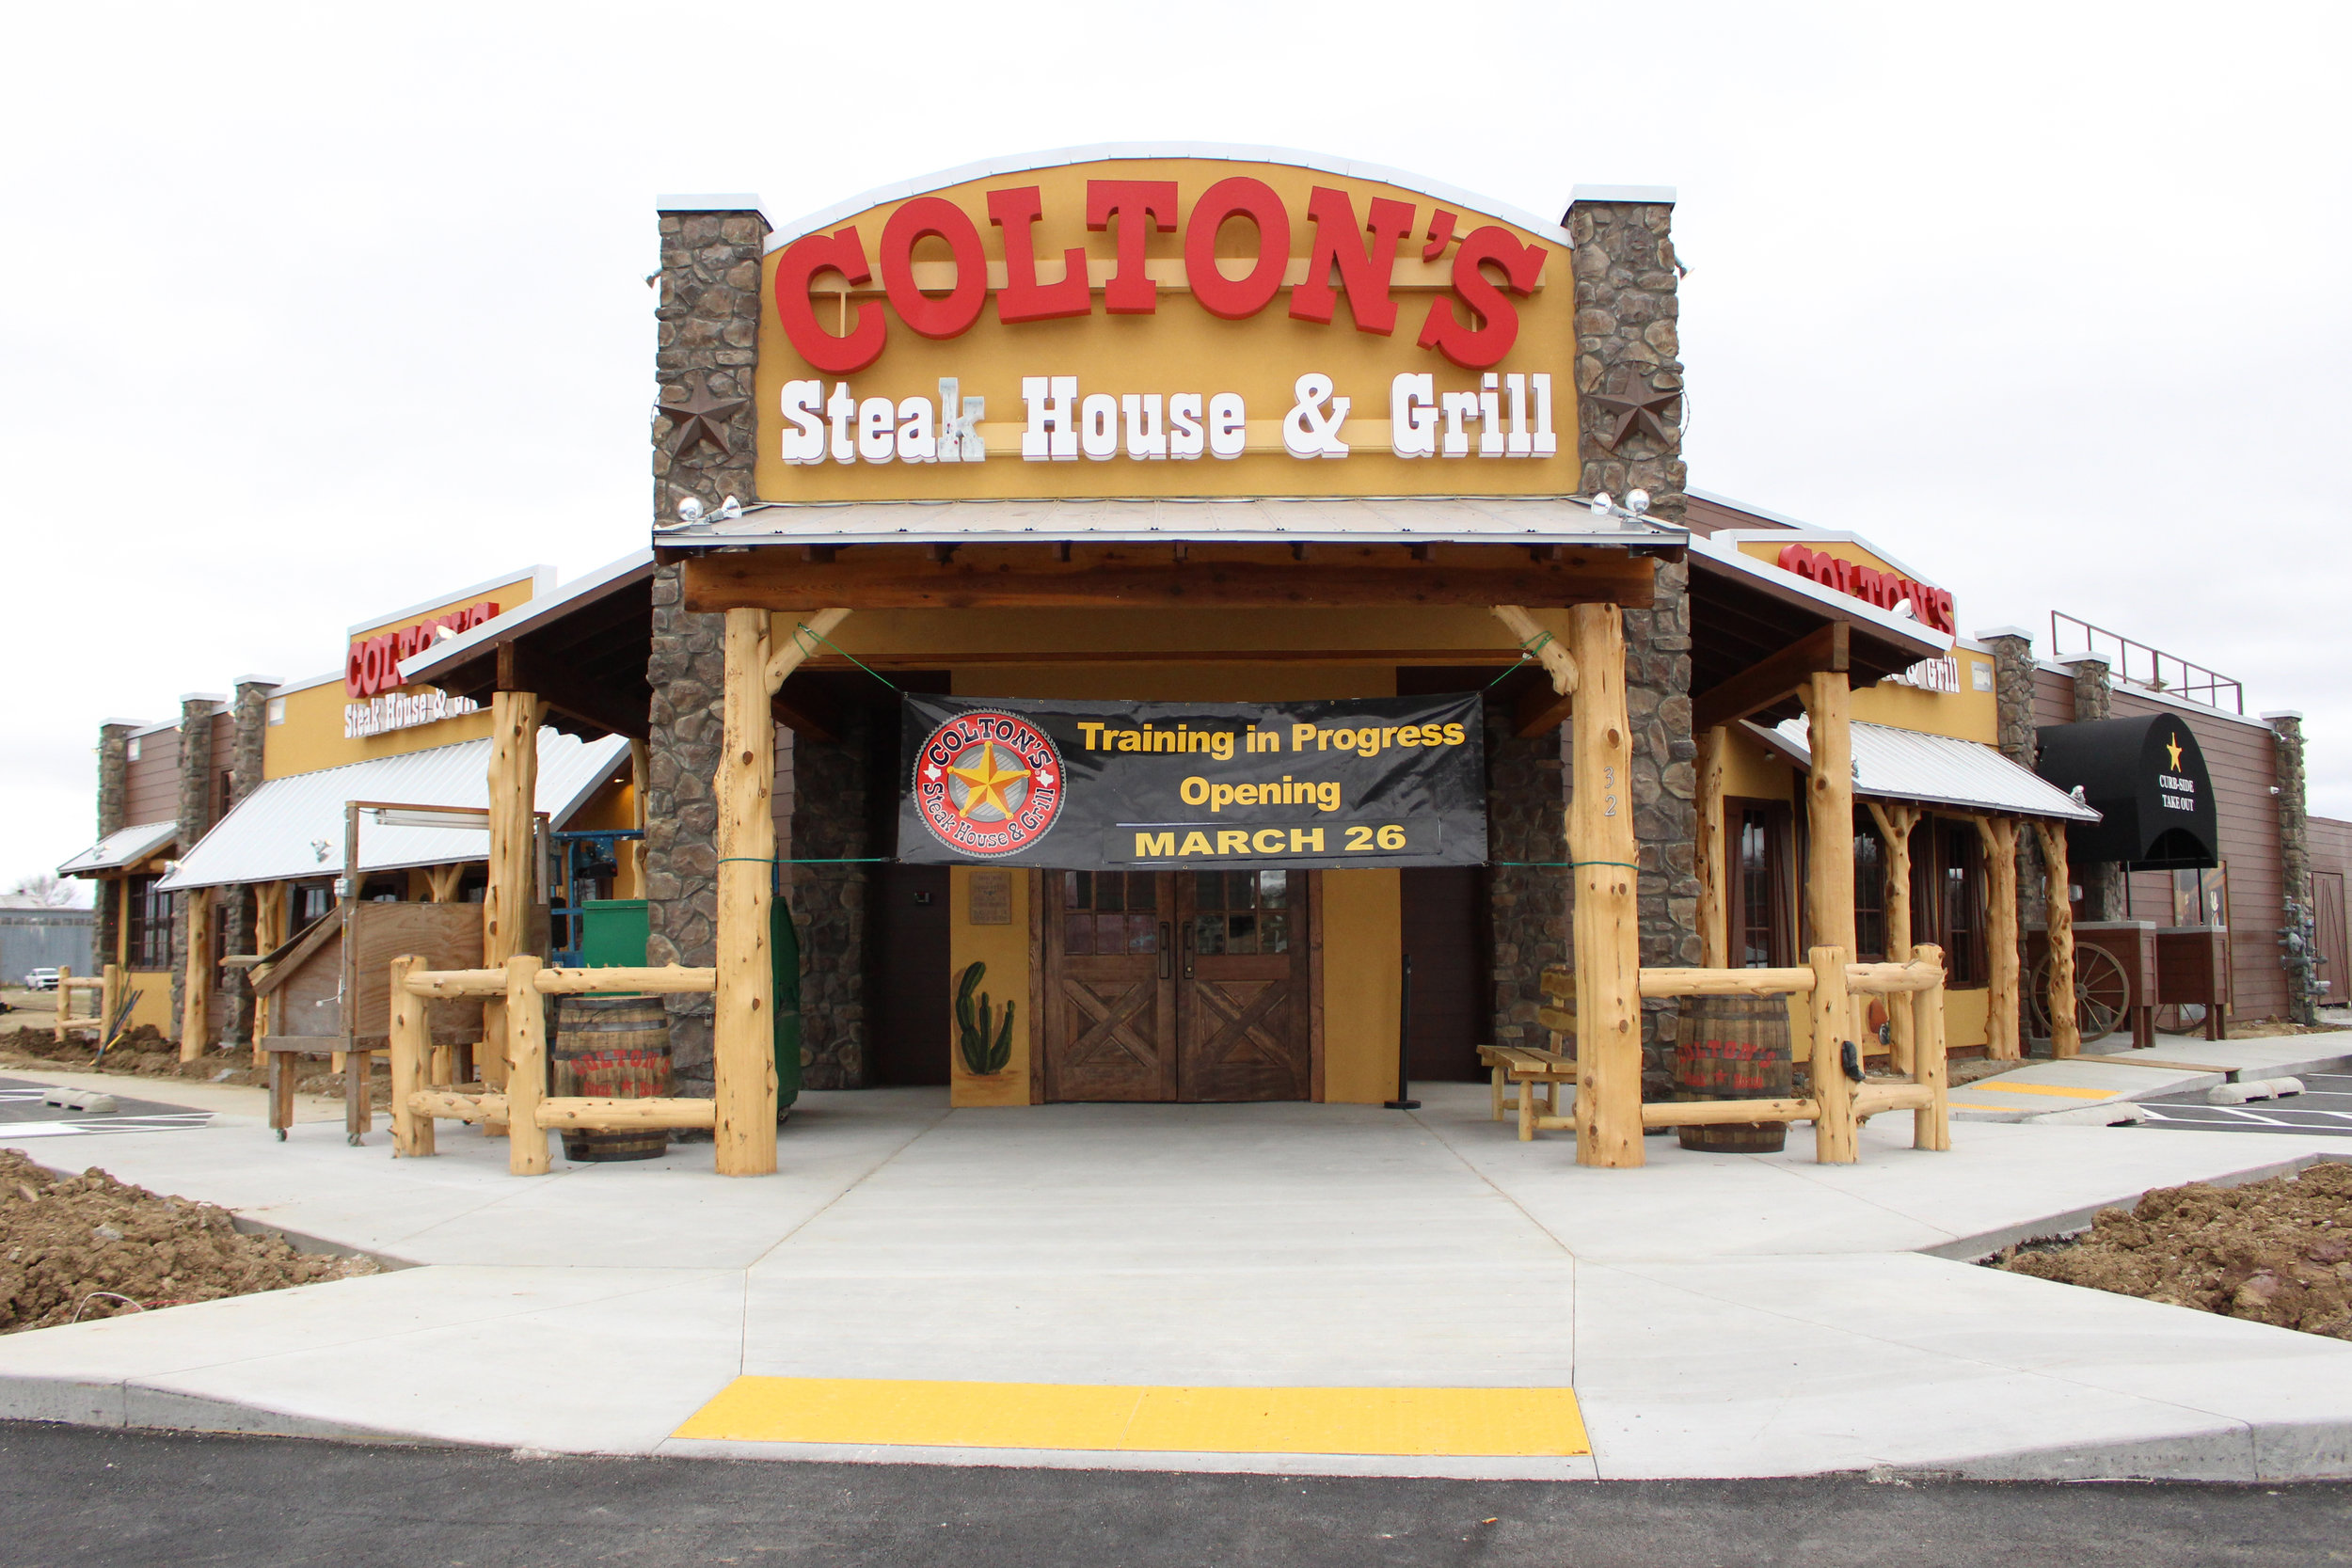 colton's steak house & Grill - river west 32 west alexander boulevard